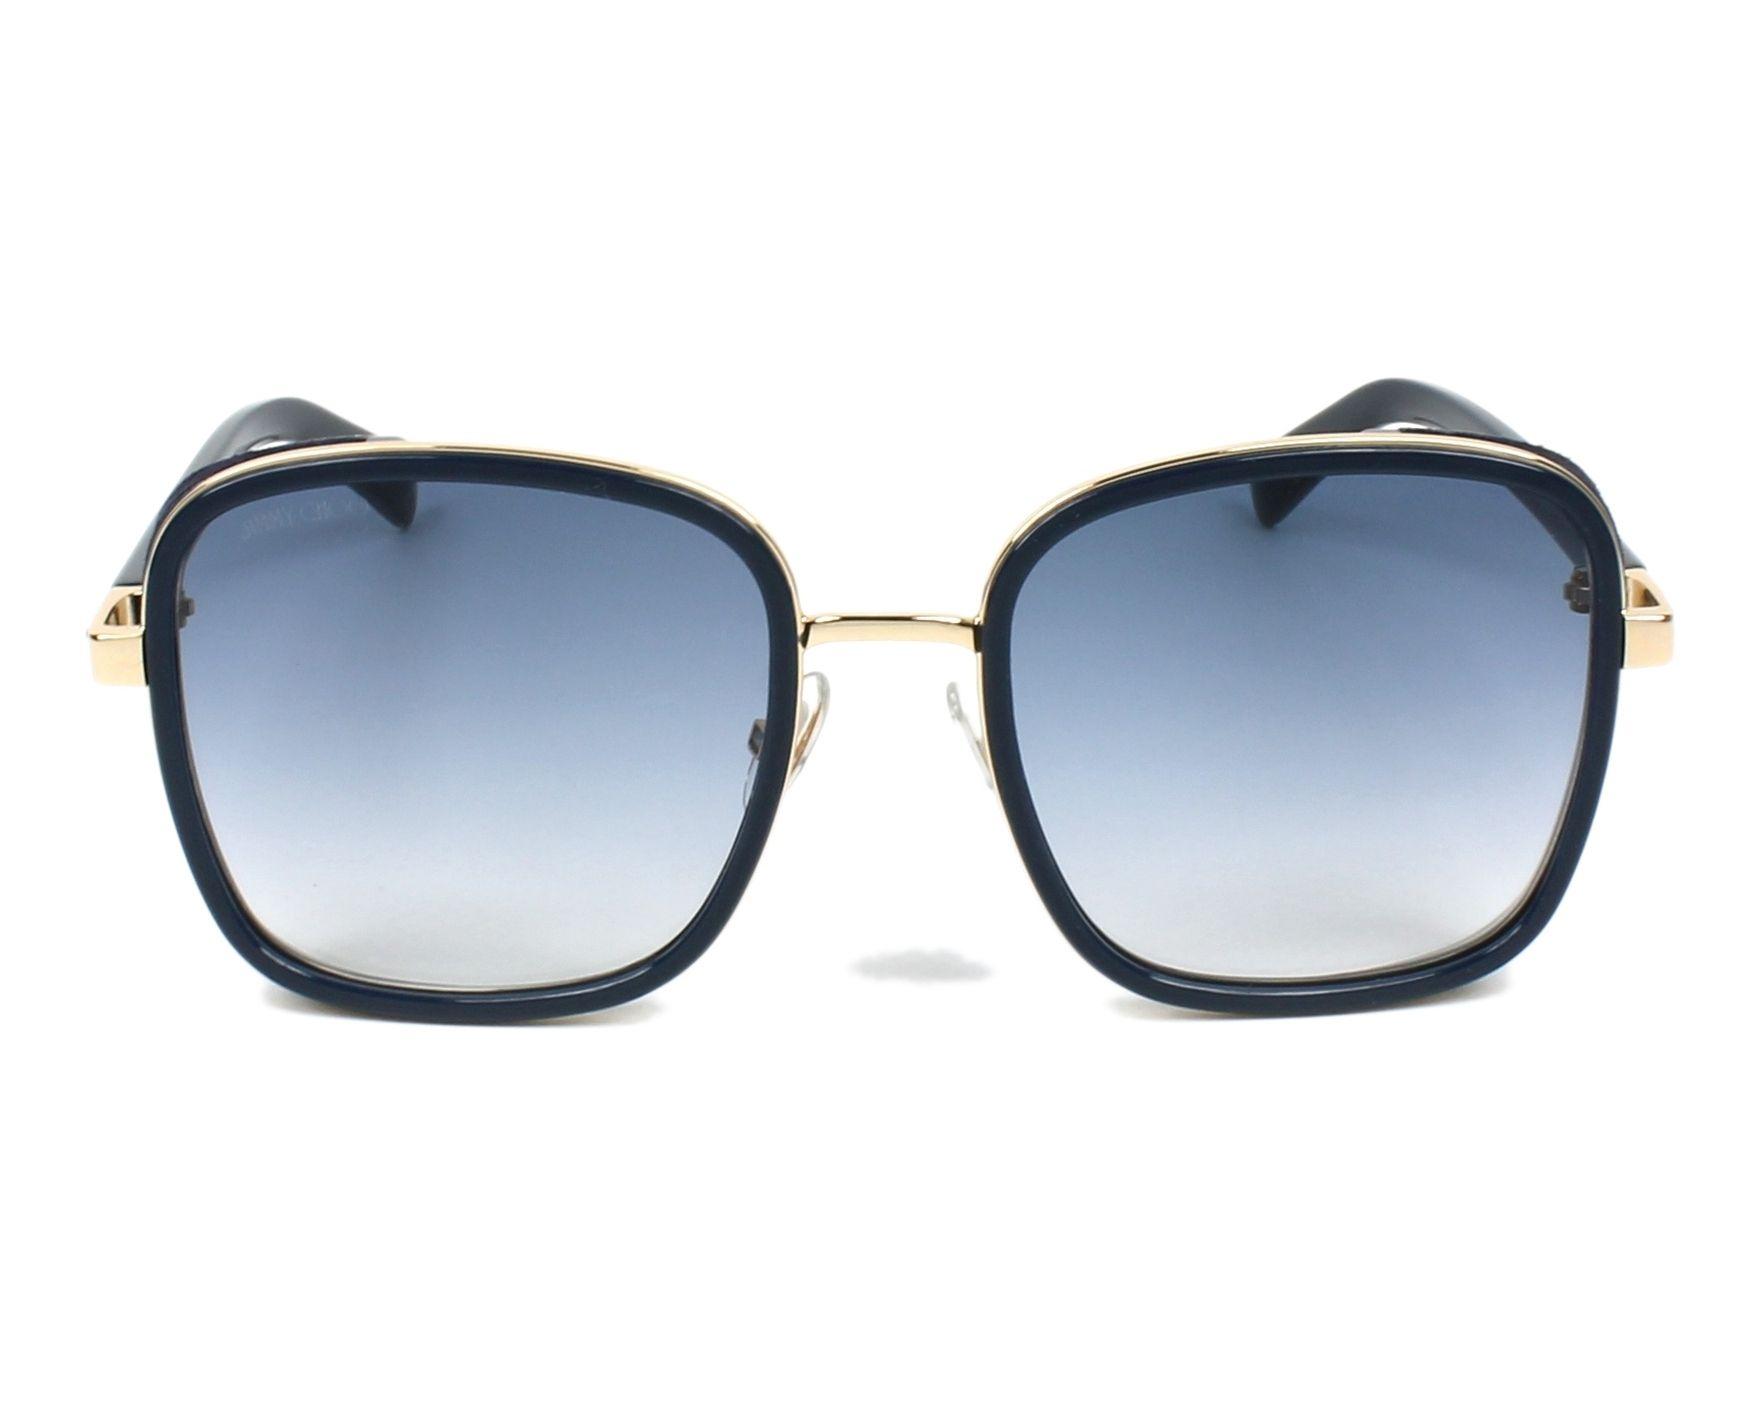 4a44d6122874 thumbnail Sunglasses Jimmy Choo ELVA-S KY2 08 - Blue Gold front view